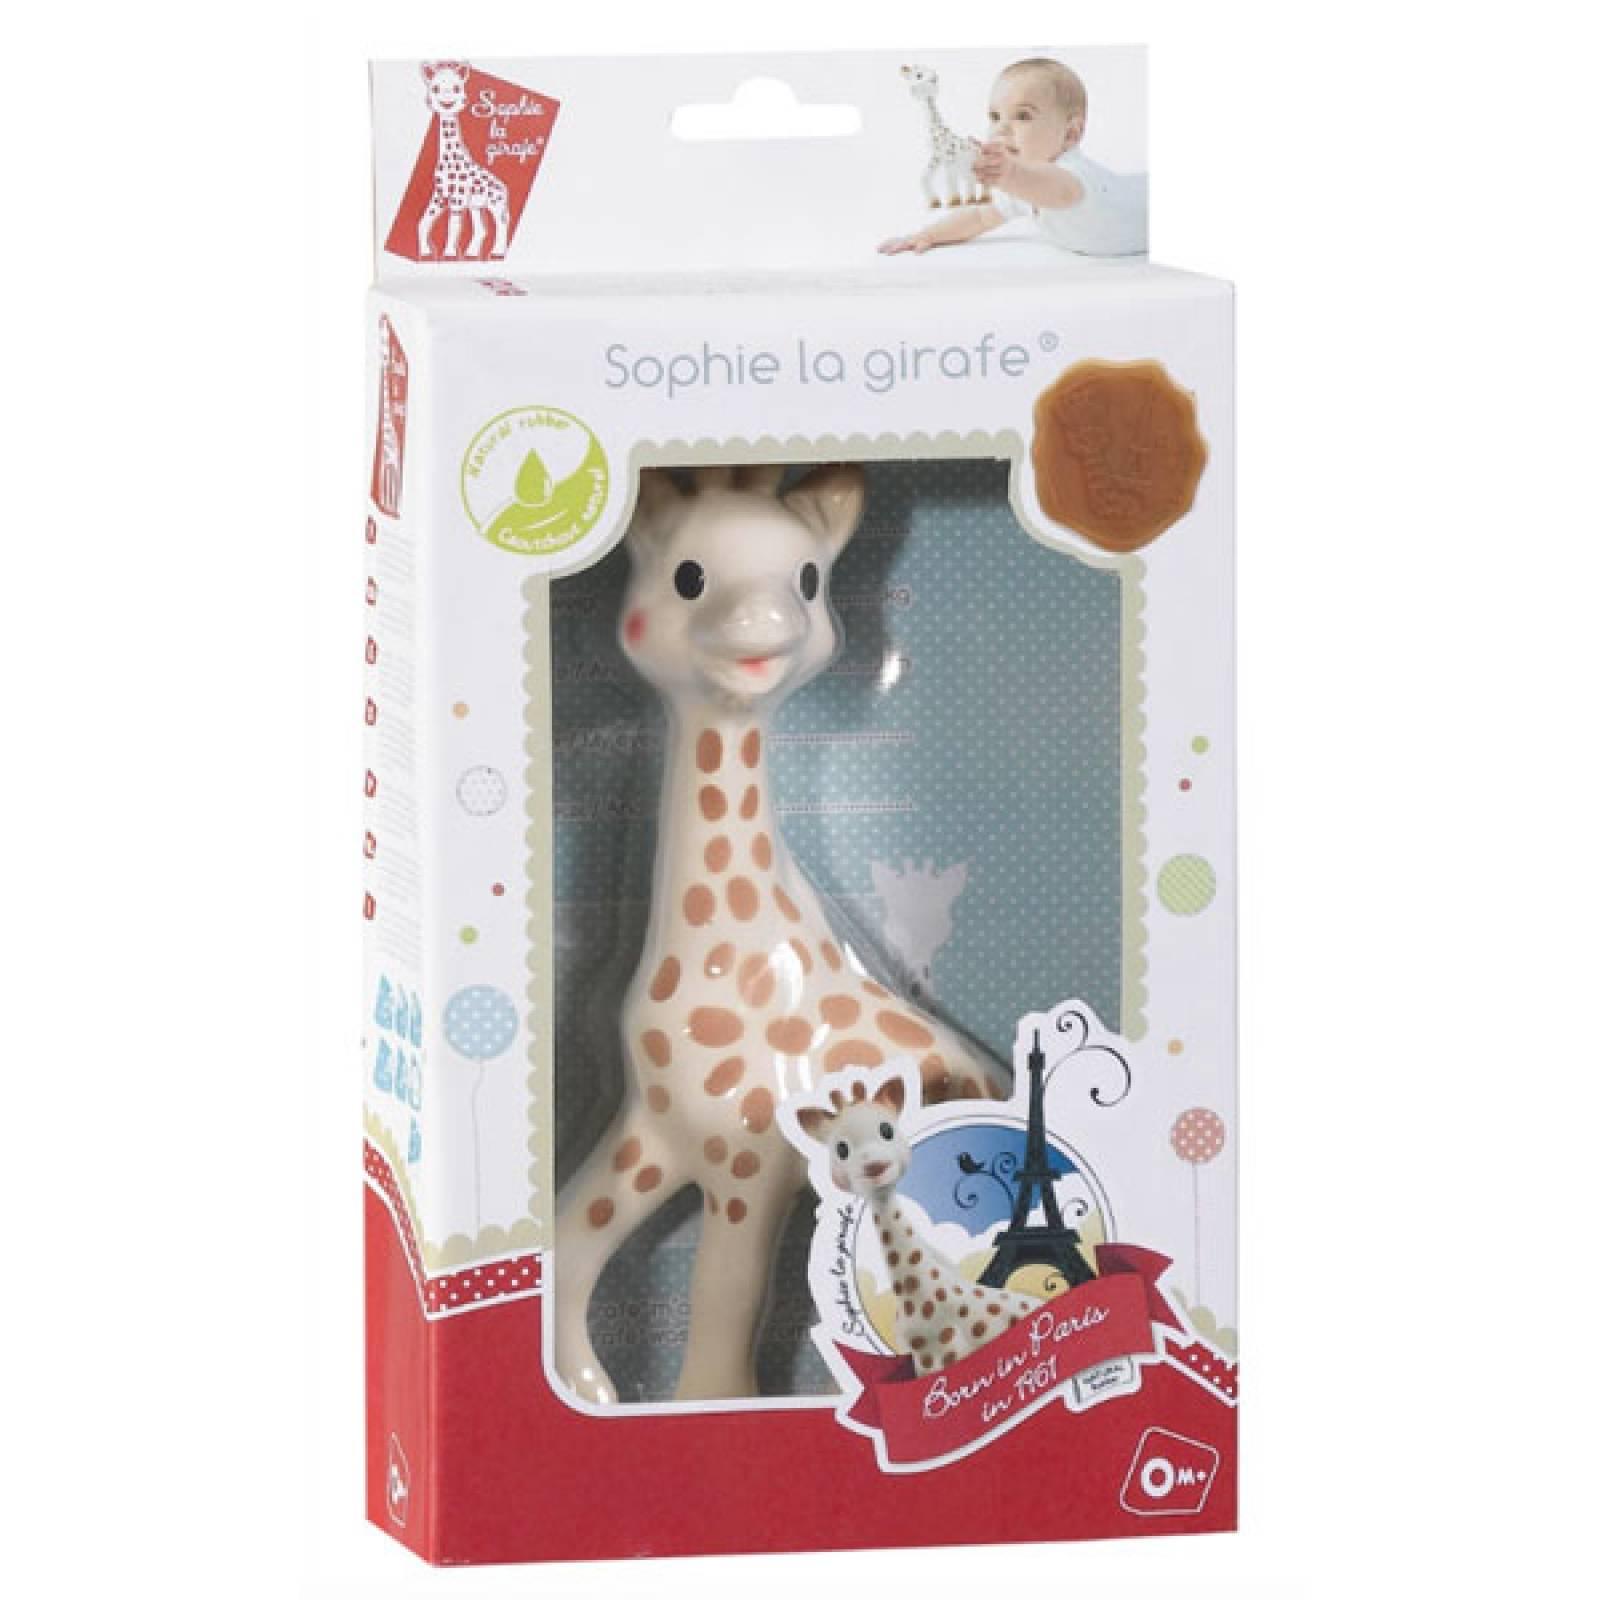 Sophie the Giraffe/ Sophie la Girafe Baby Squeaker Teething Toy thumbnails